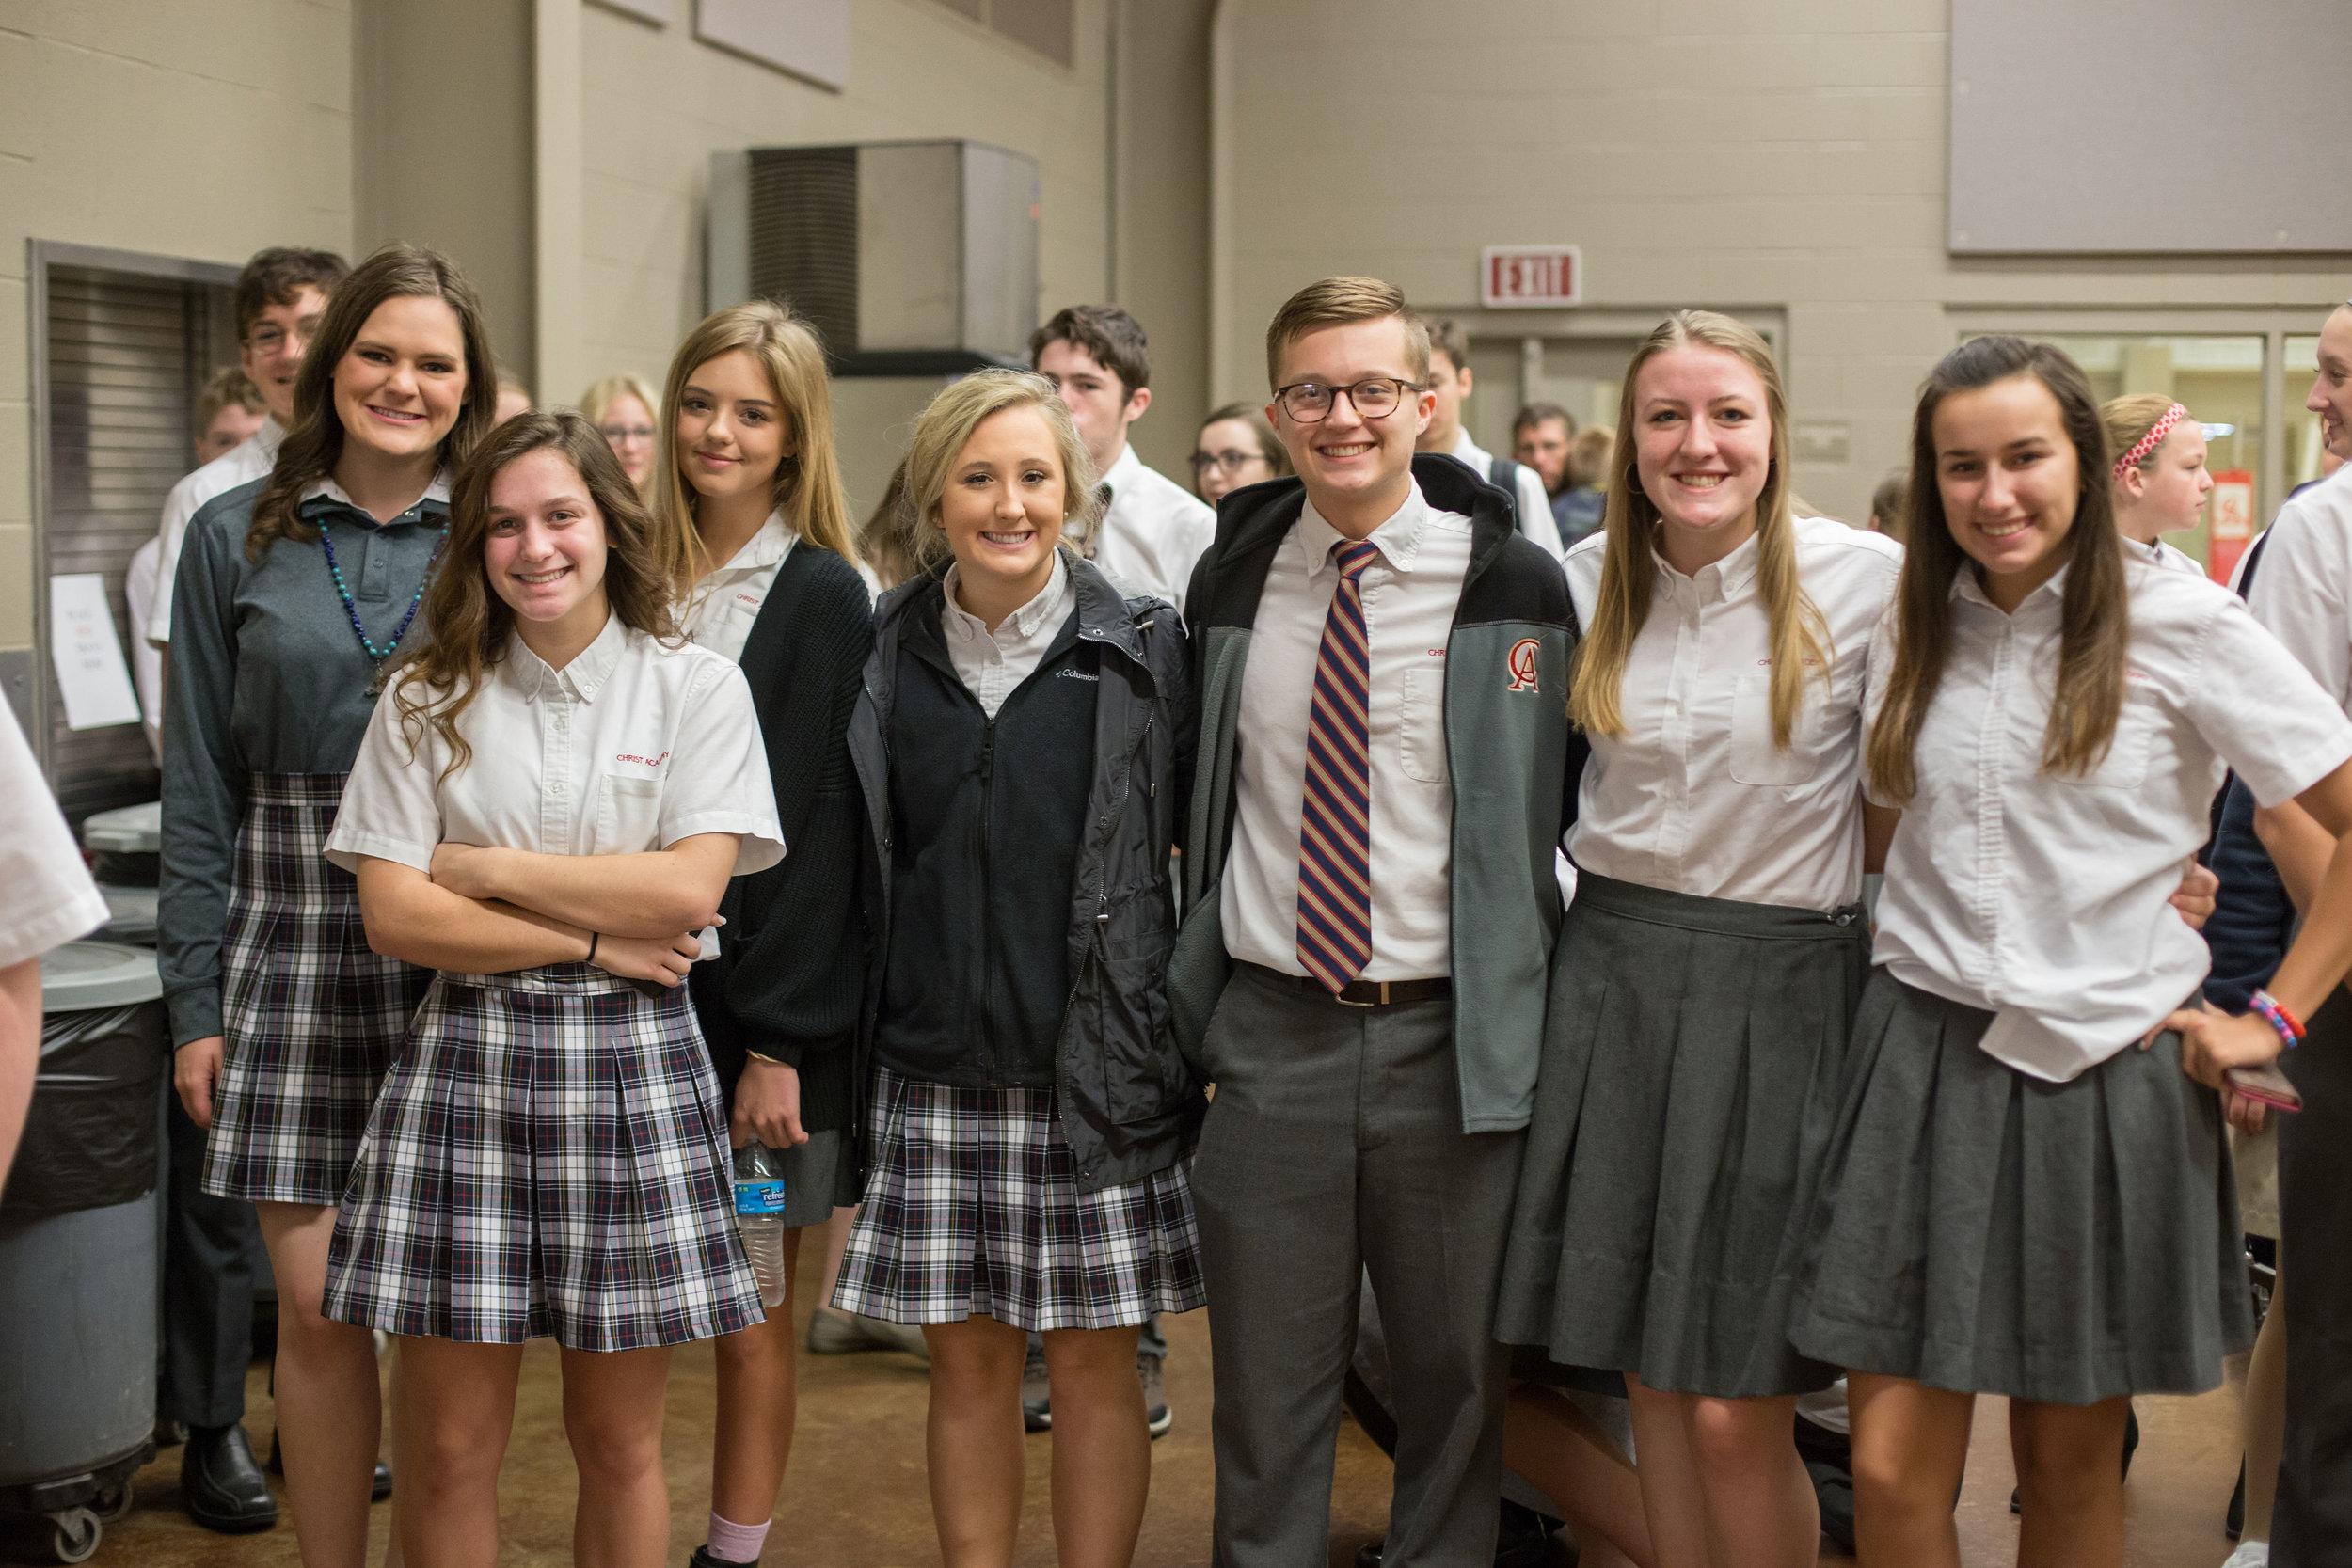 christ-academy-wichita-falls-tx-dual-credit-vernon-college-senior-high.jpg